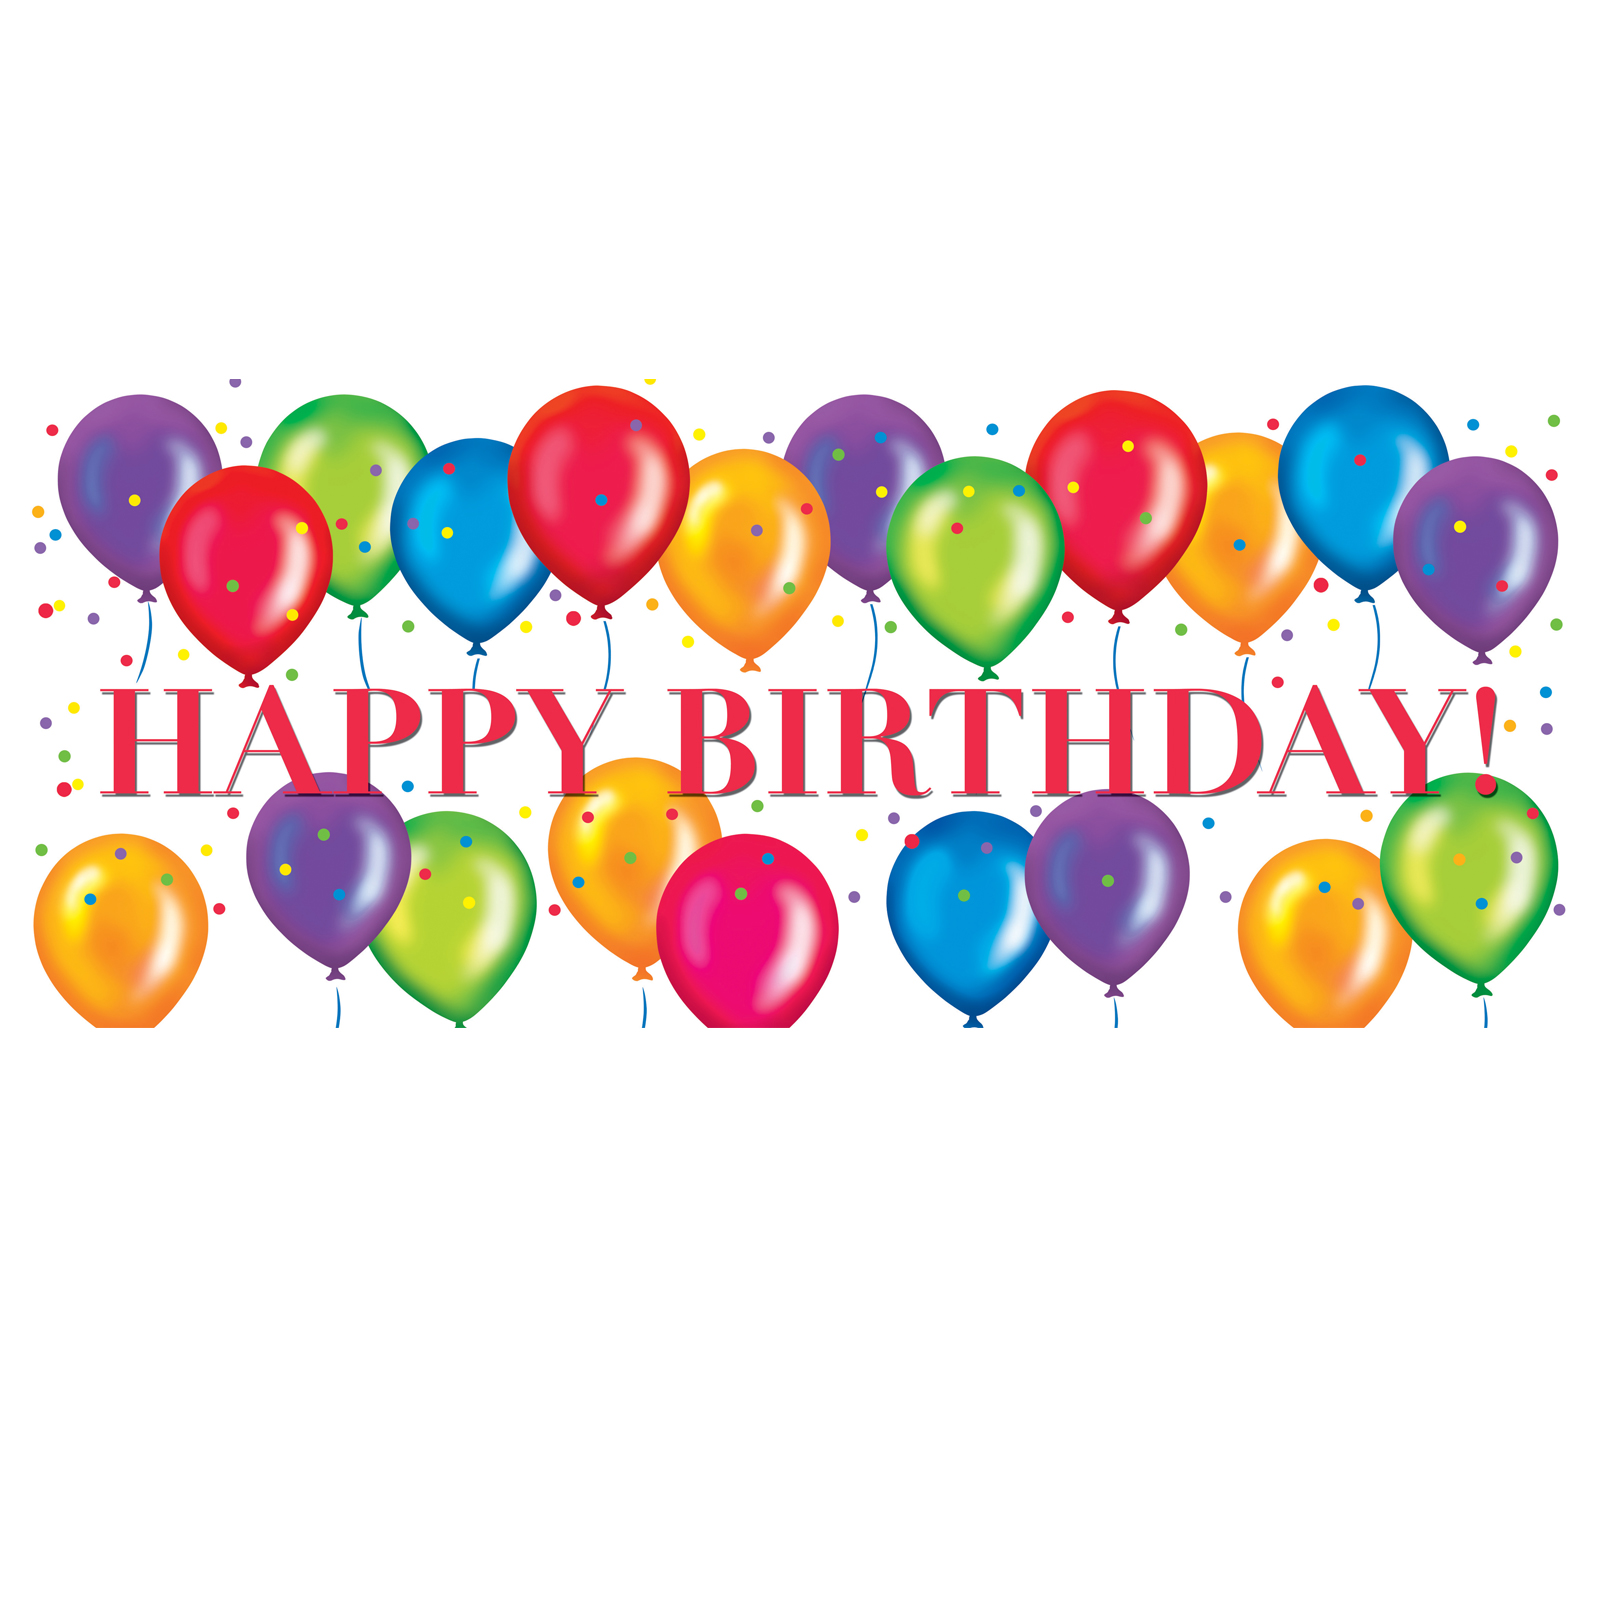 1600x1600 Happy Birthday Balloons Clipart Cartoon Birthday Balloons Clip Art